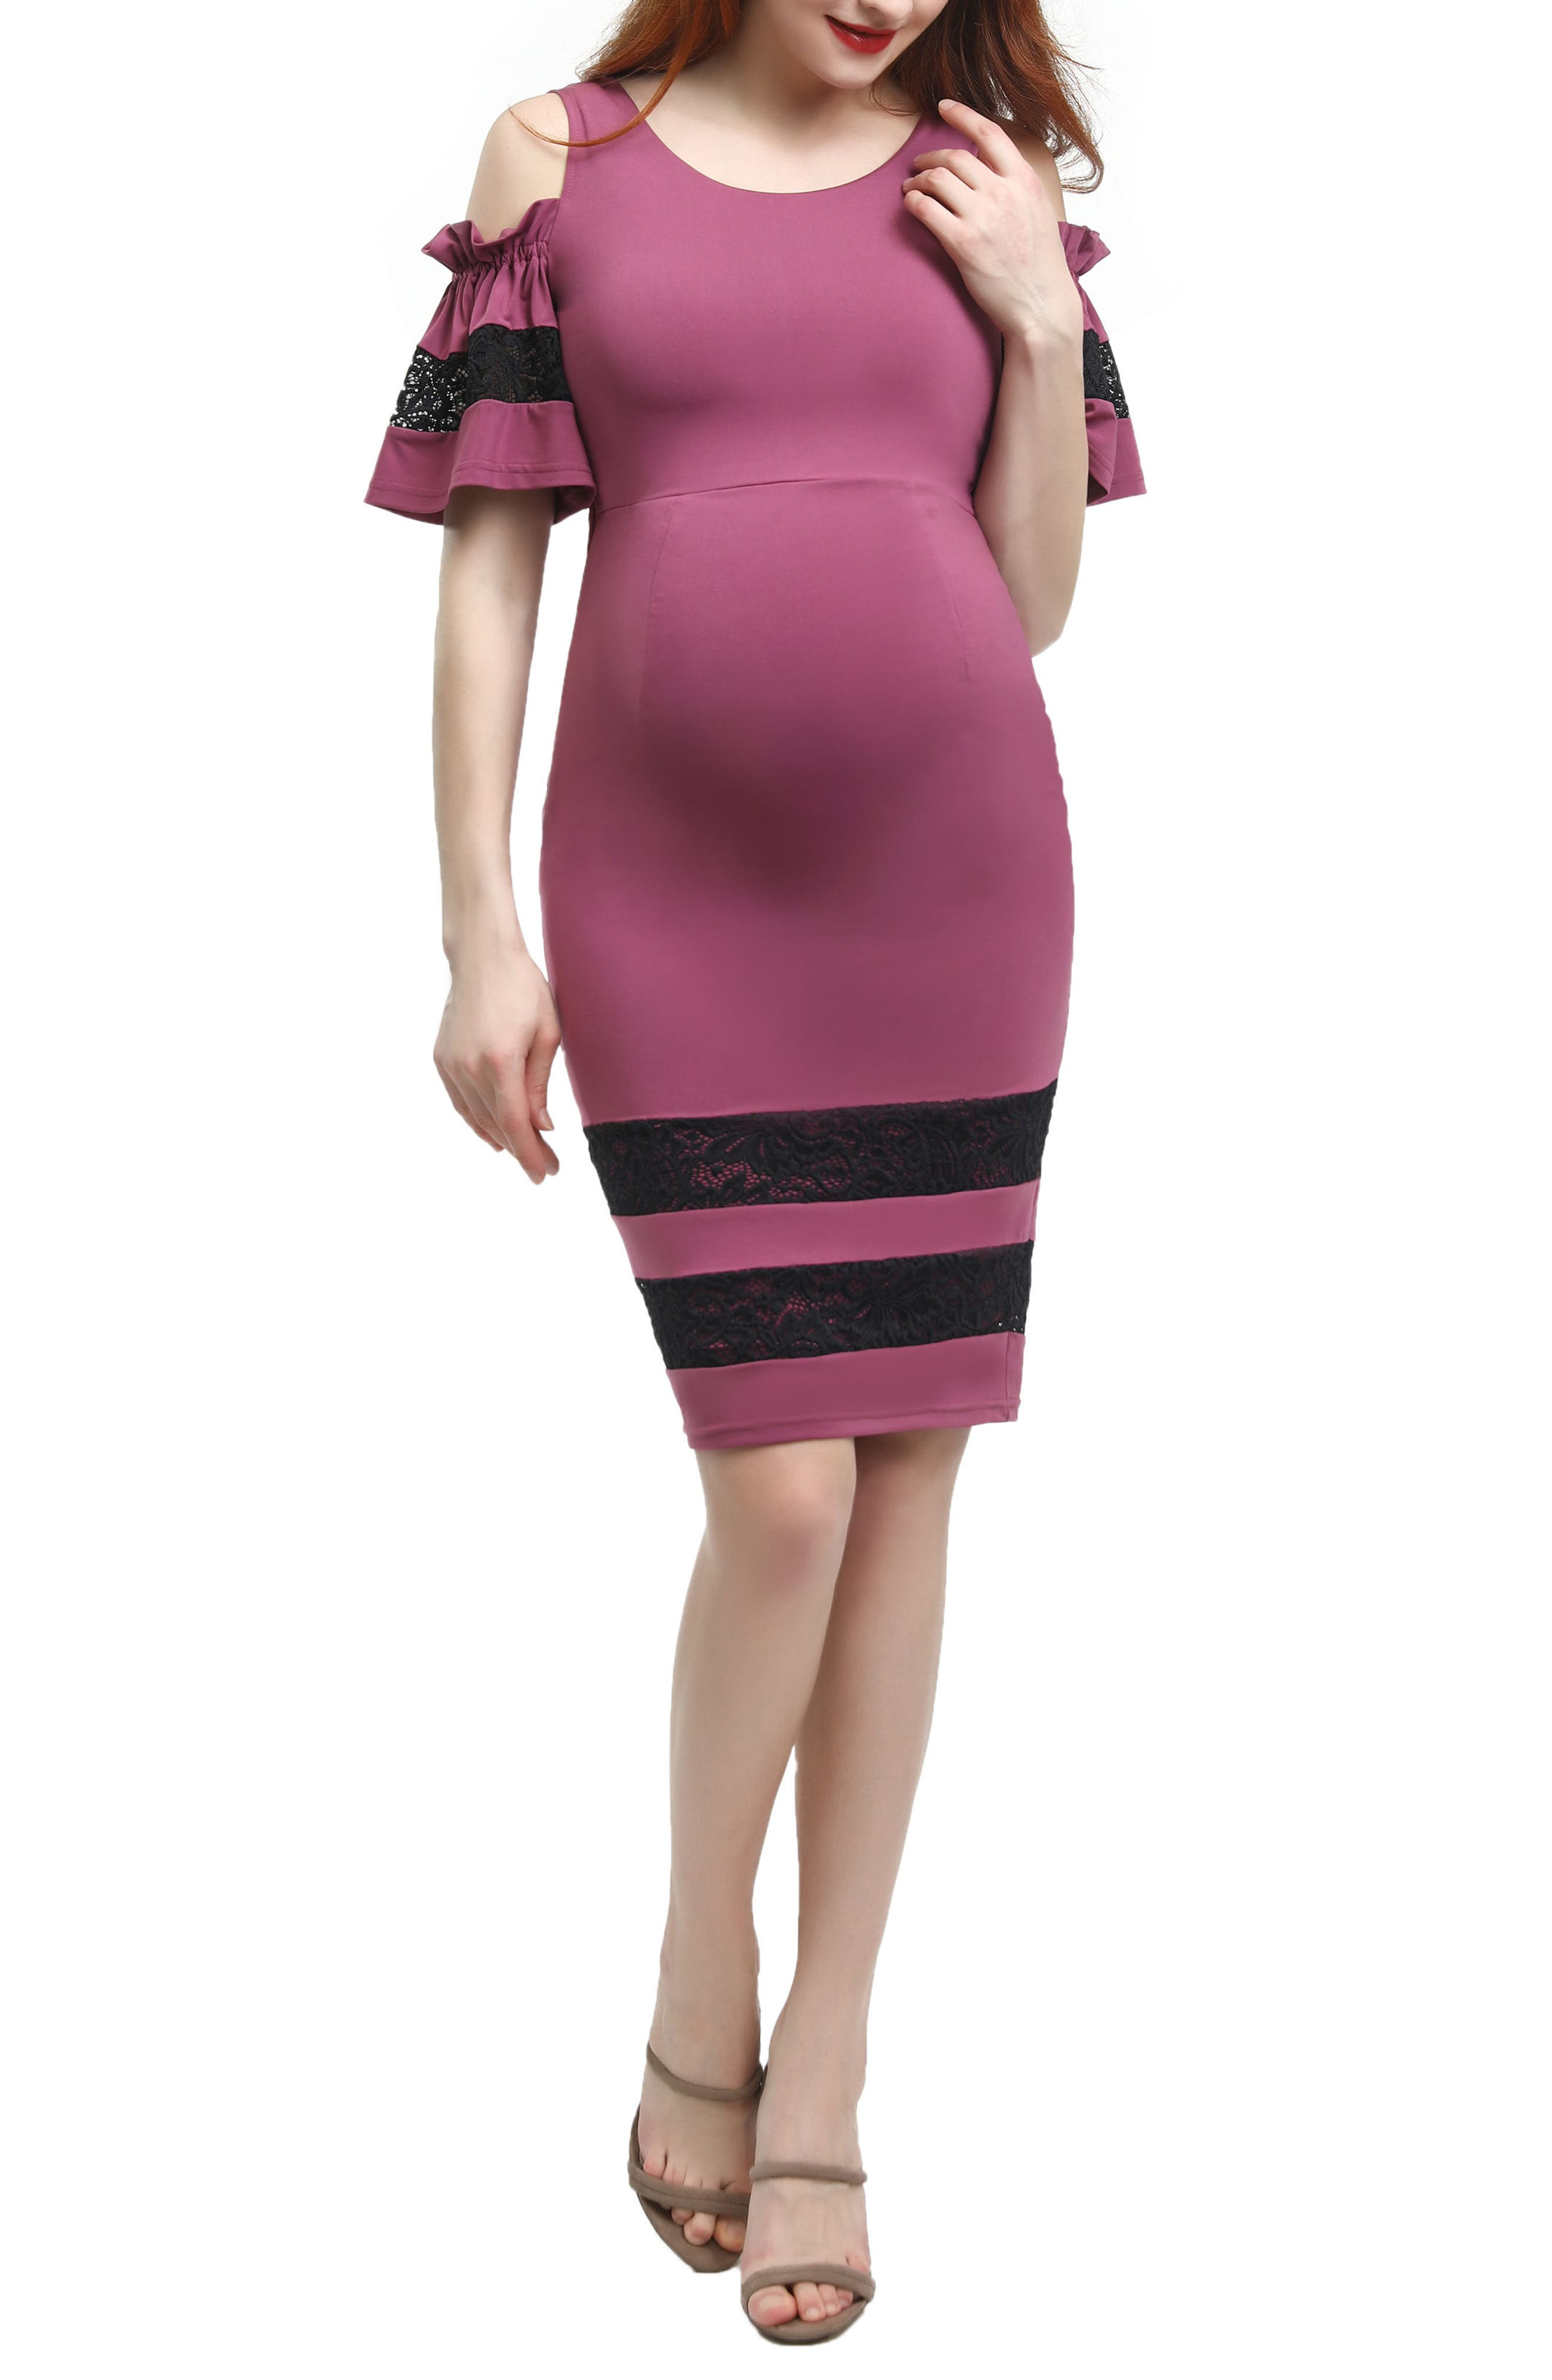 Kimi And Kai Marissa Cold Shoulder Maternity Sheath Dress, Pink